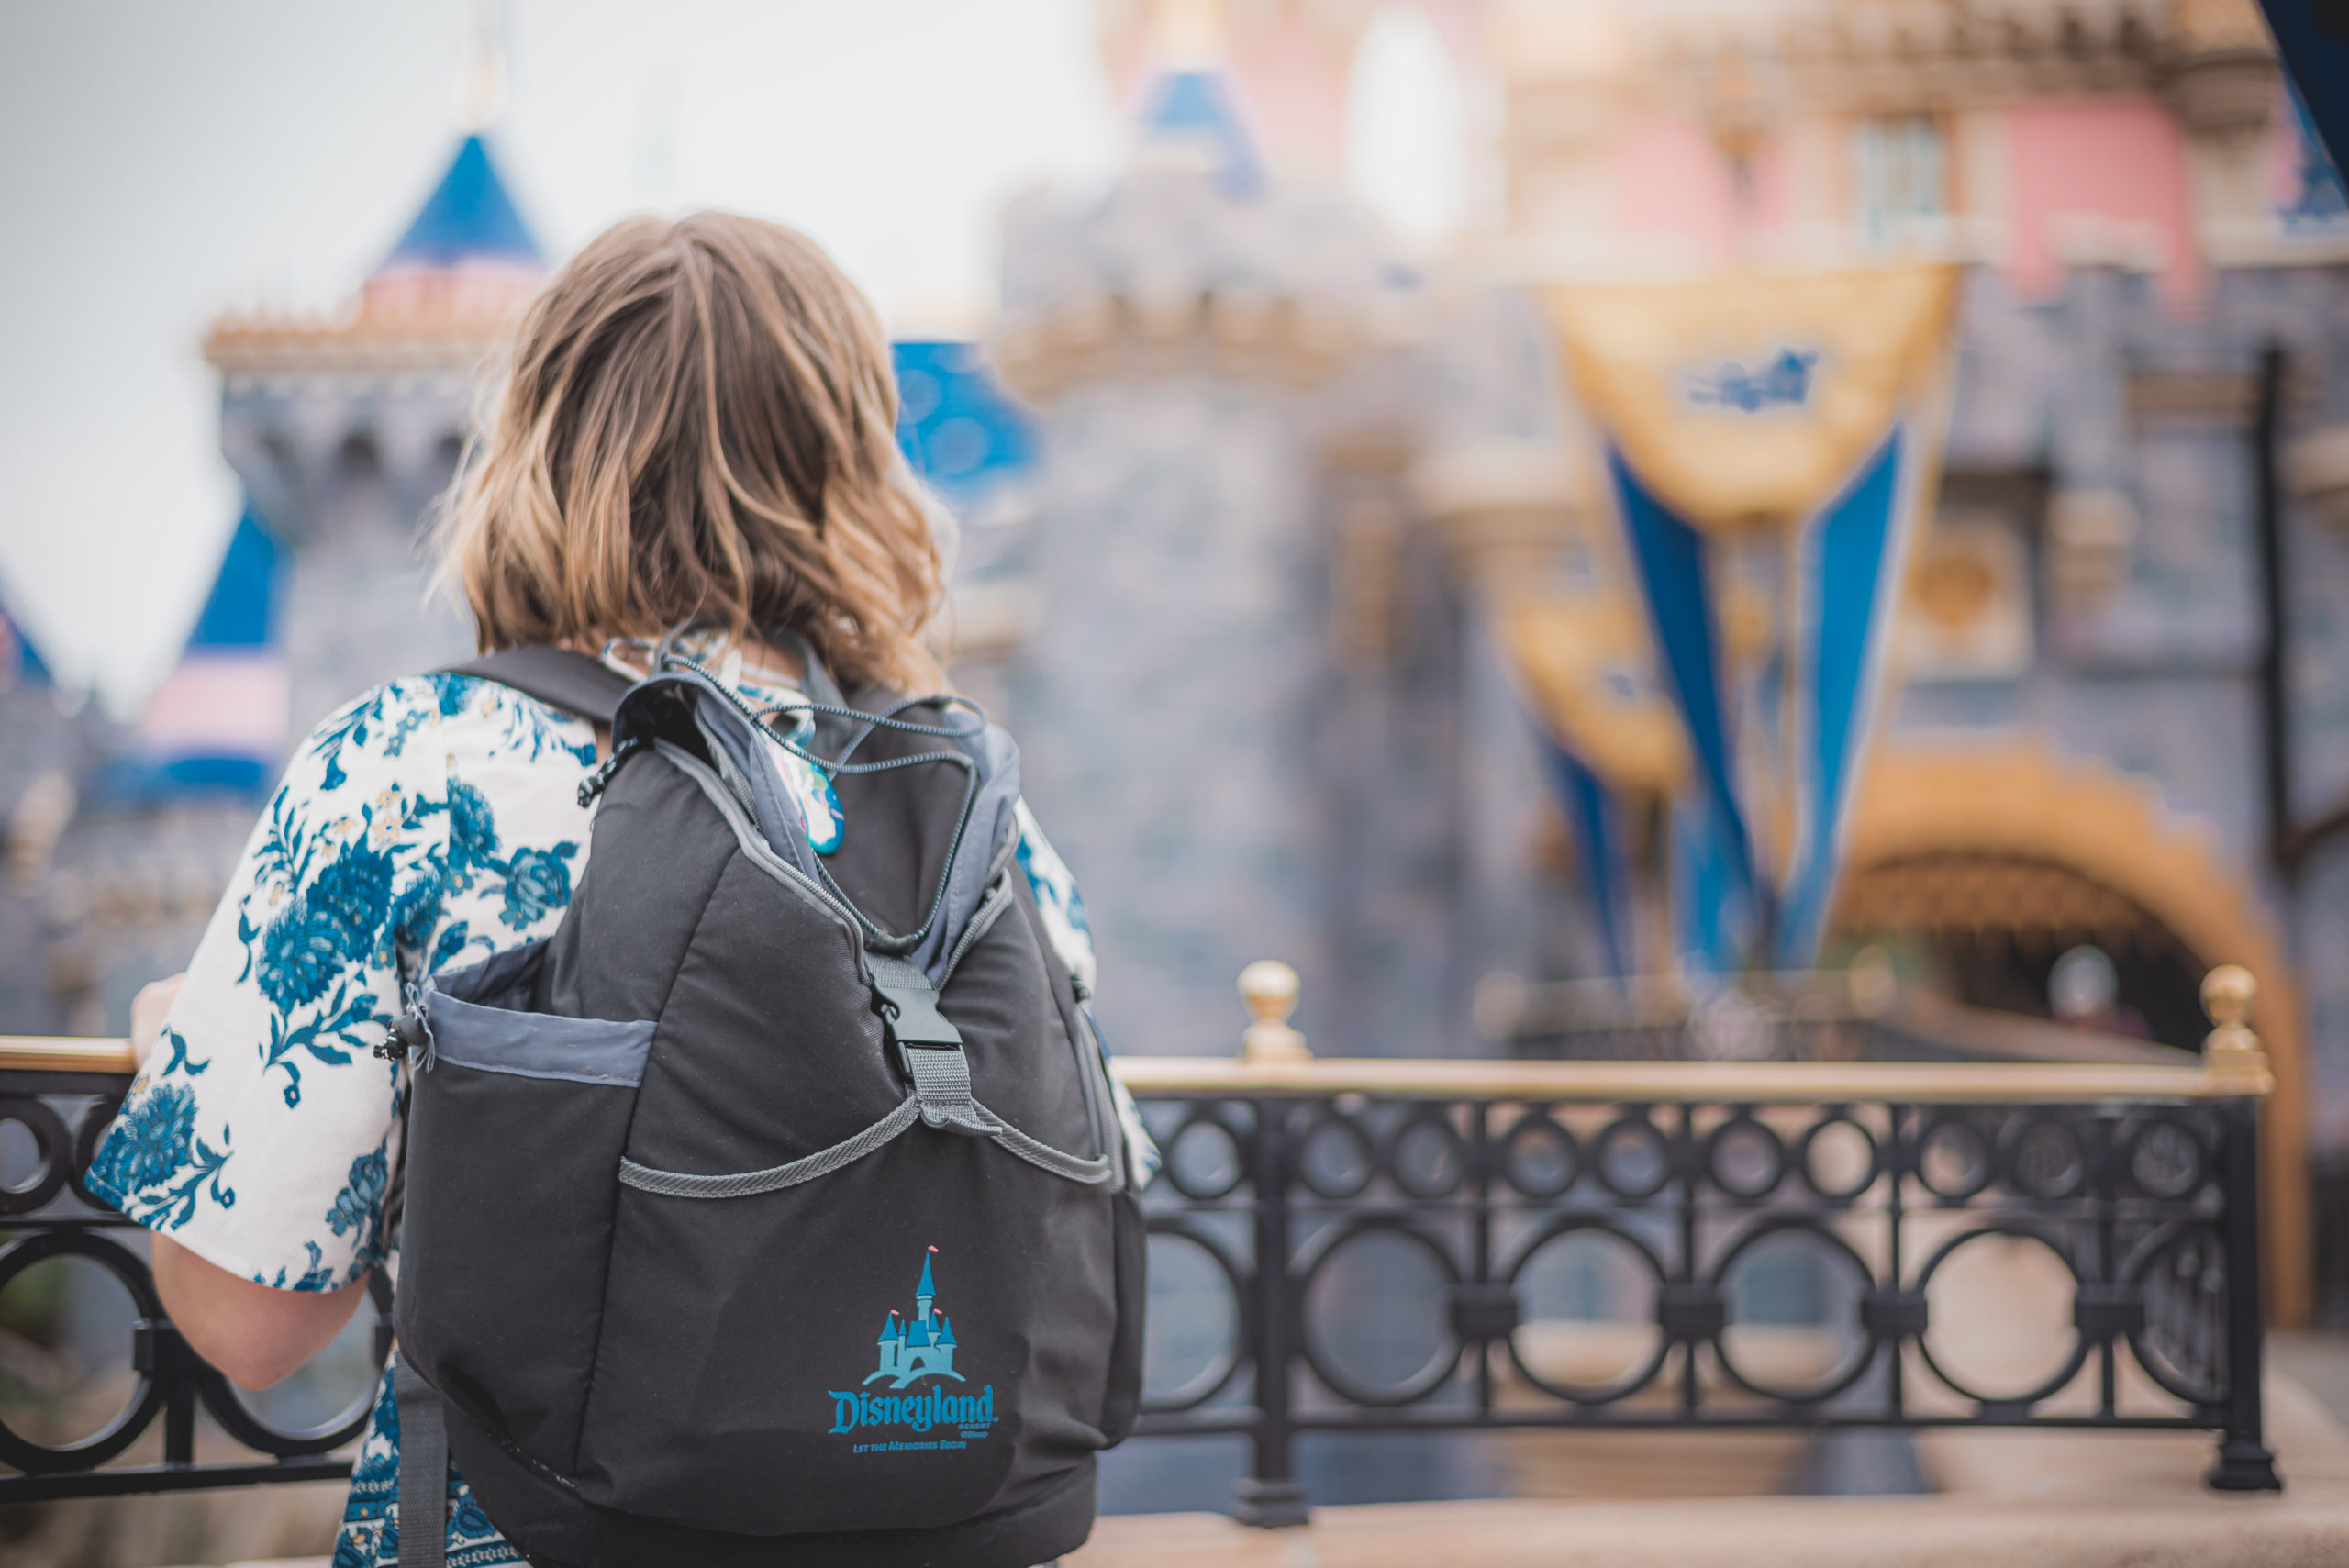 Woman with Disneyland Backpack facing Sleeping Beauty Castle